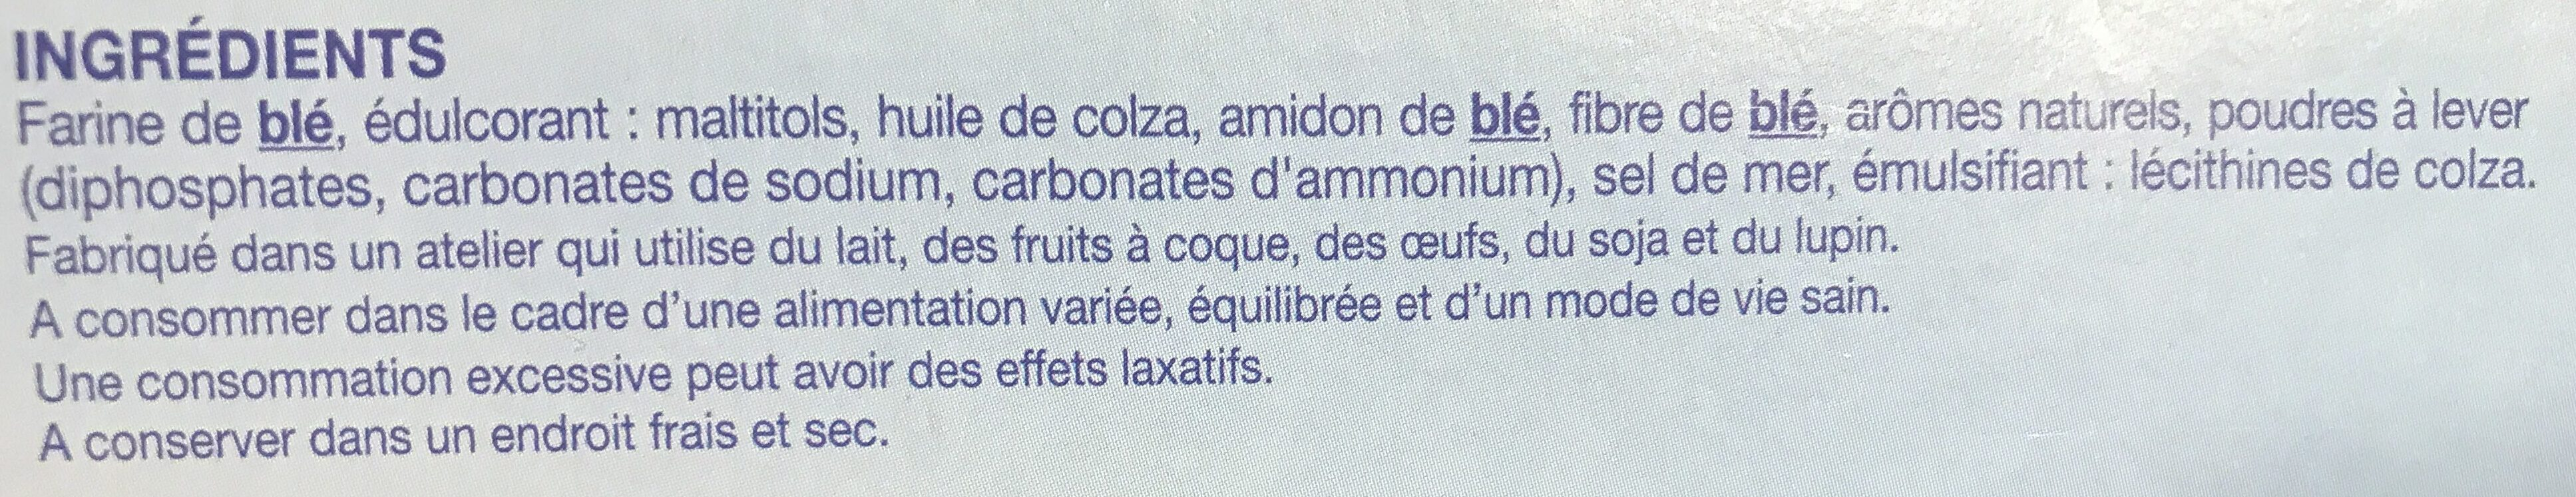 Biscuit Coco - Ingrediënten - fr